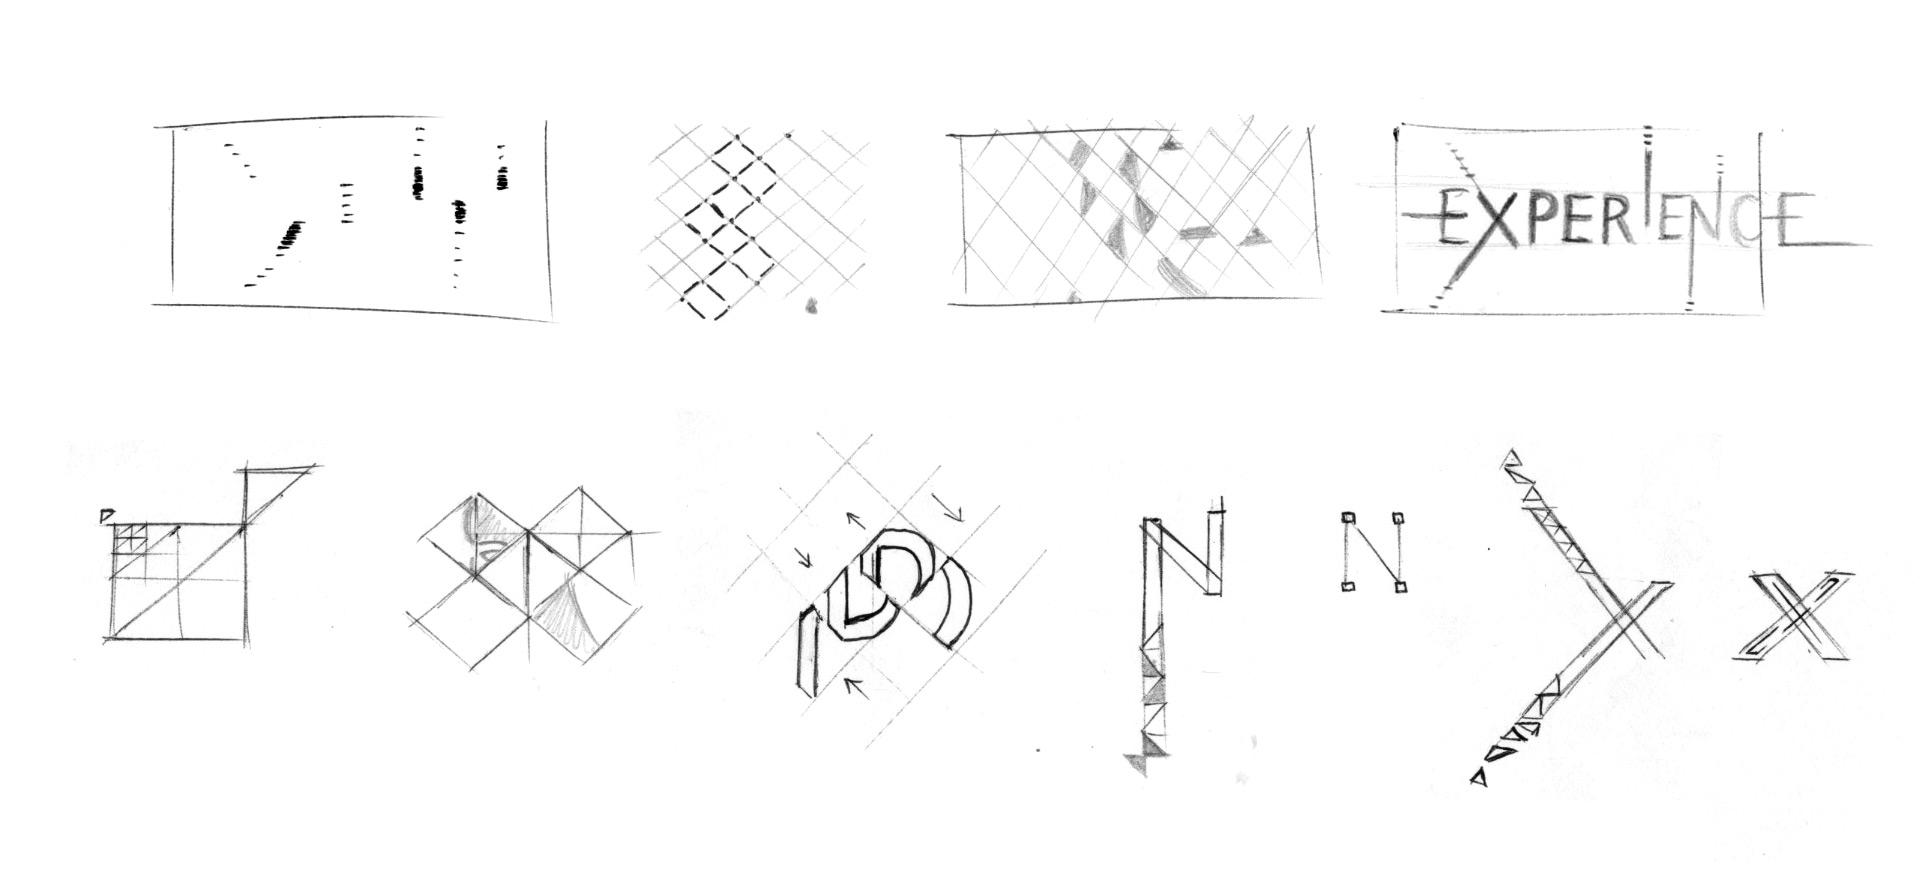 westfield_titles_sketches.jpg